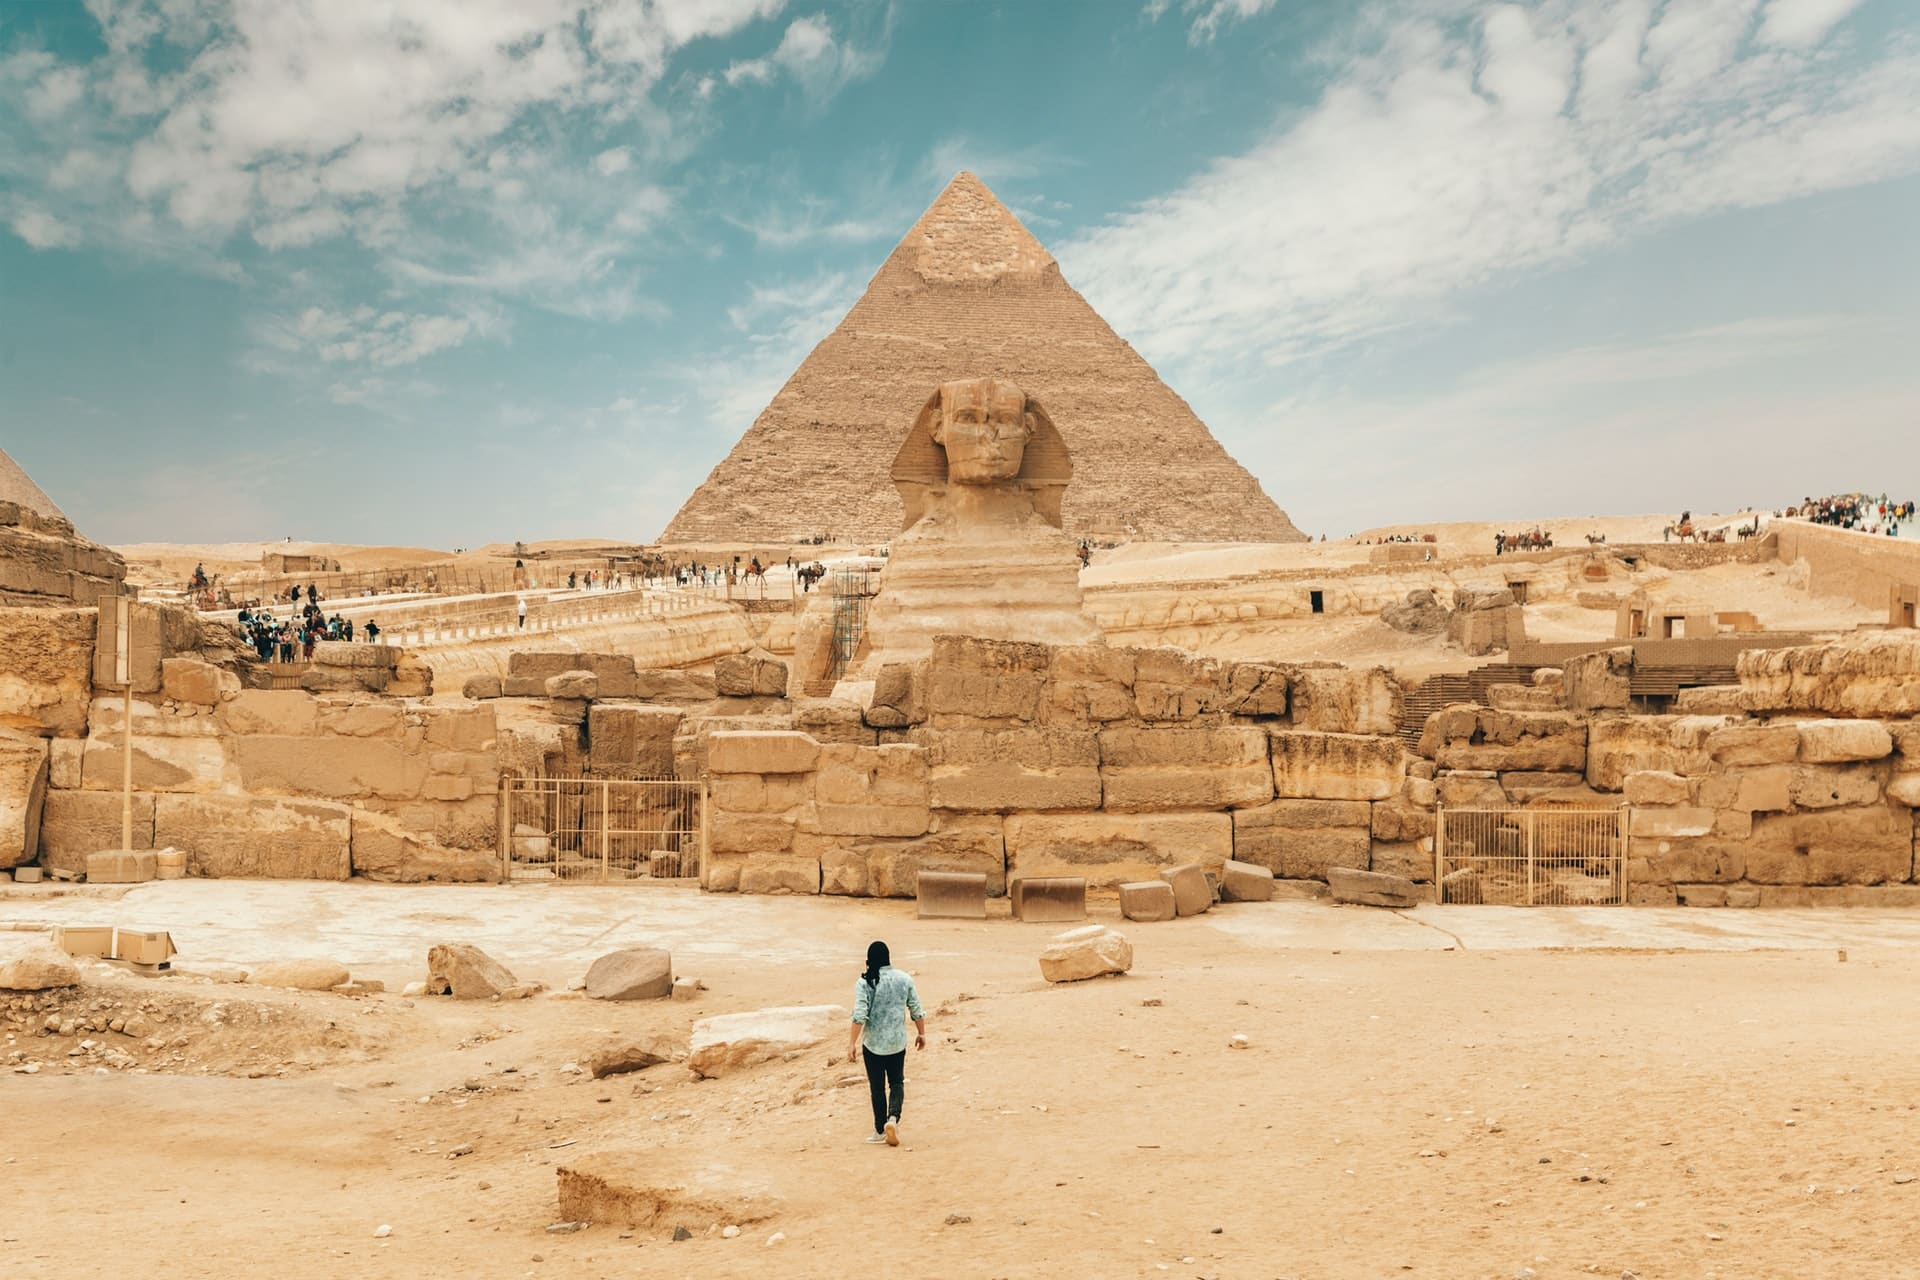 pyramid-sphinx-egypt